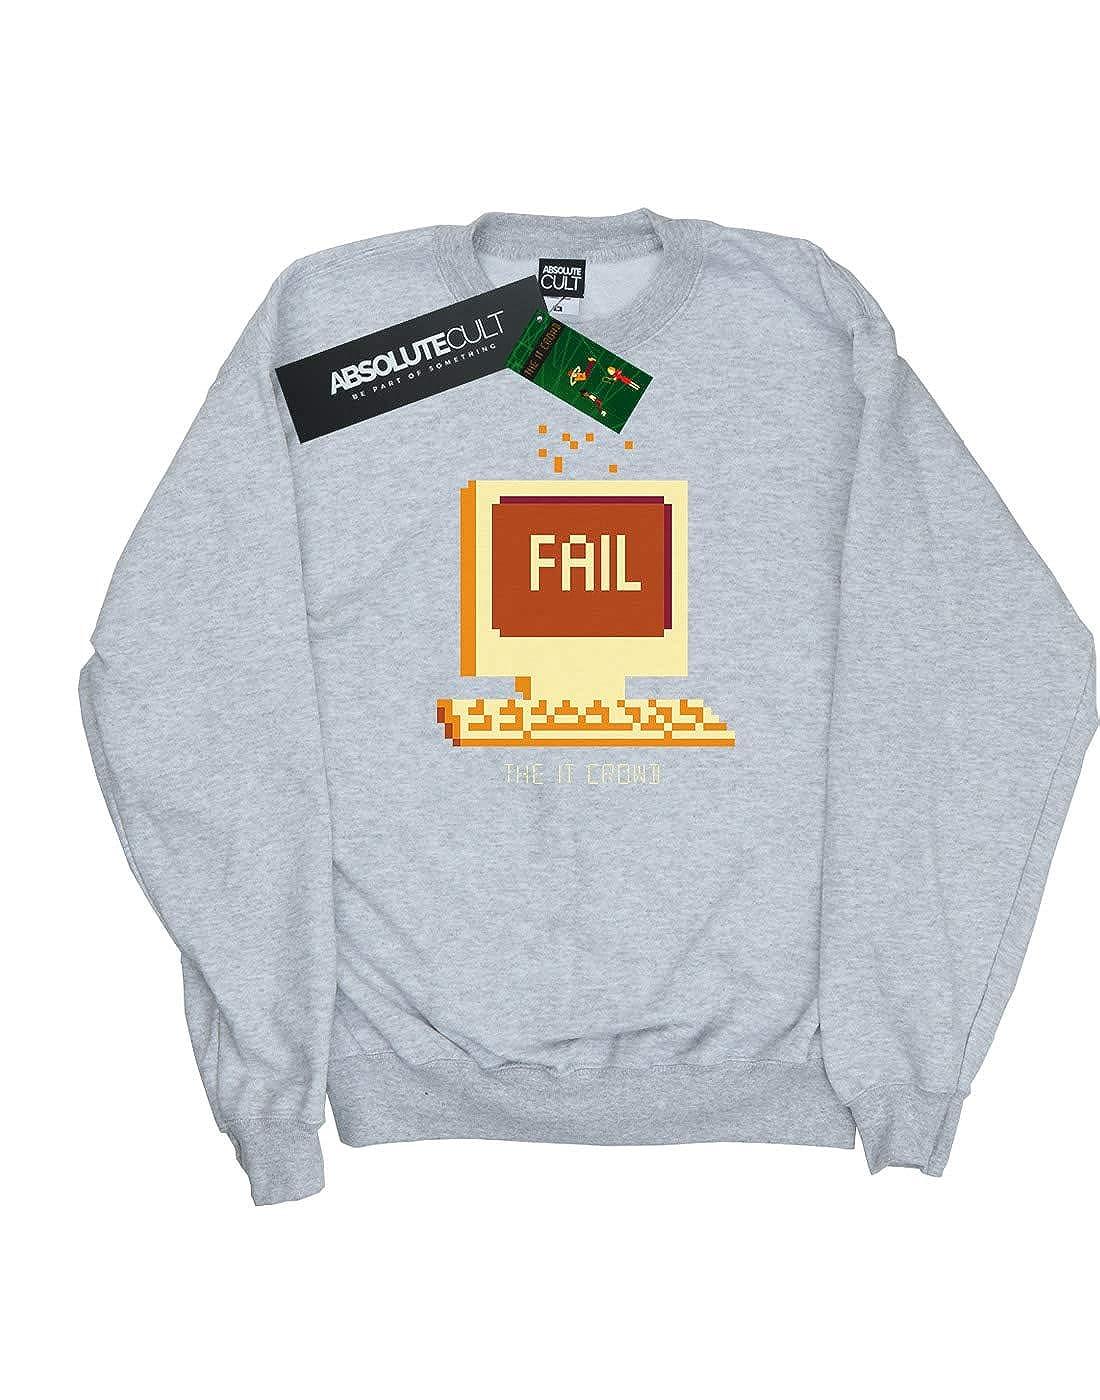 Absolute Cult The IT Crowd Girls Fail Screen Sweatshirt